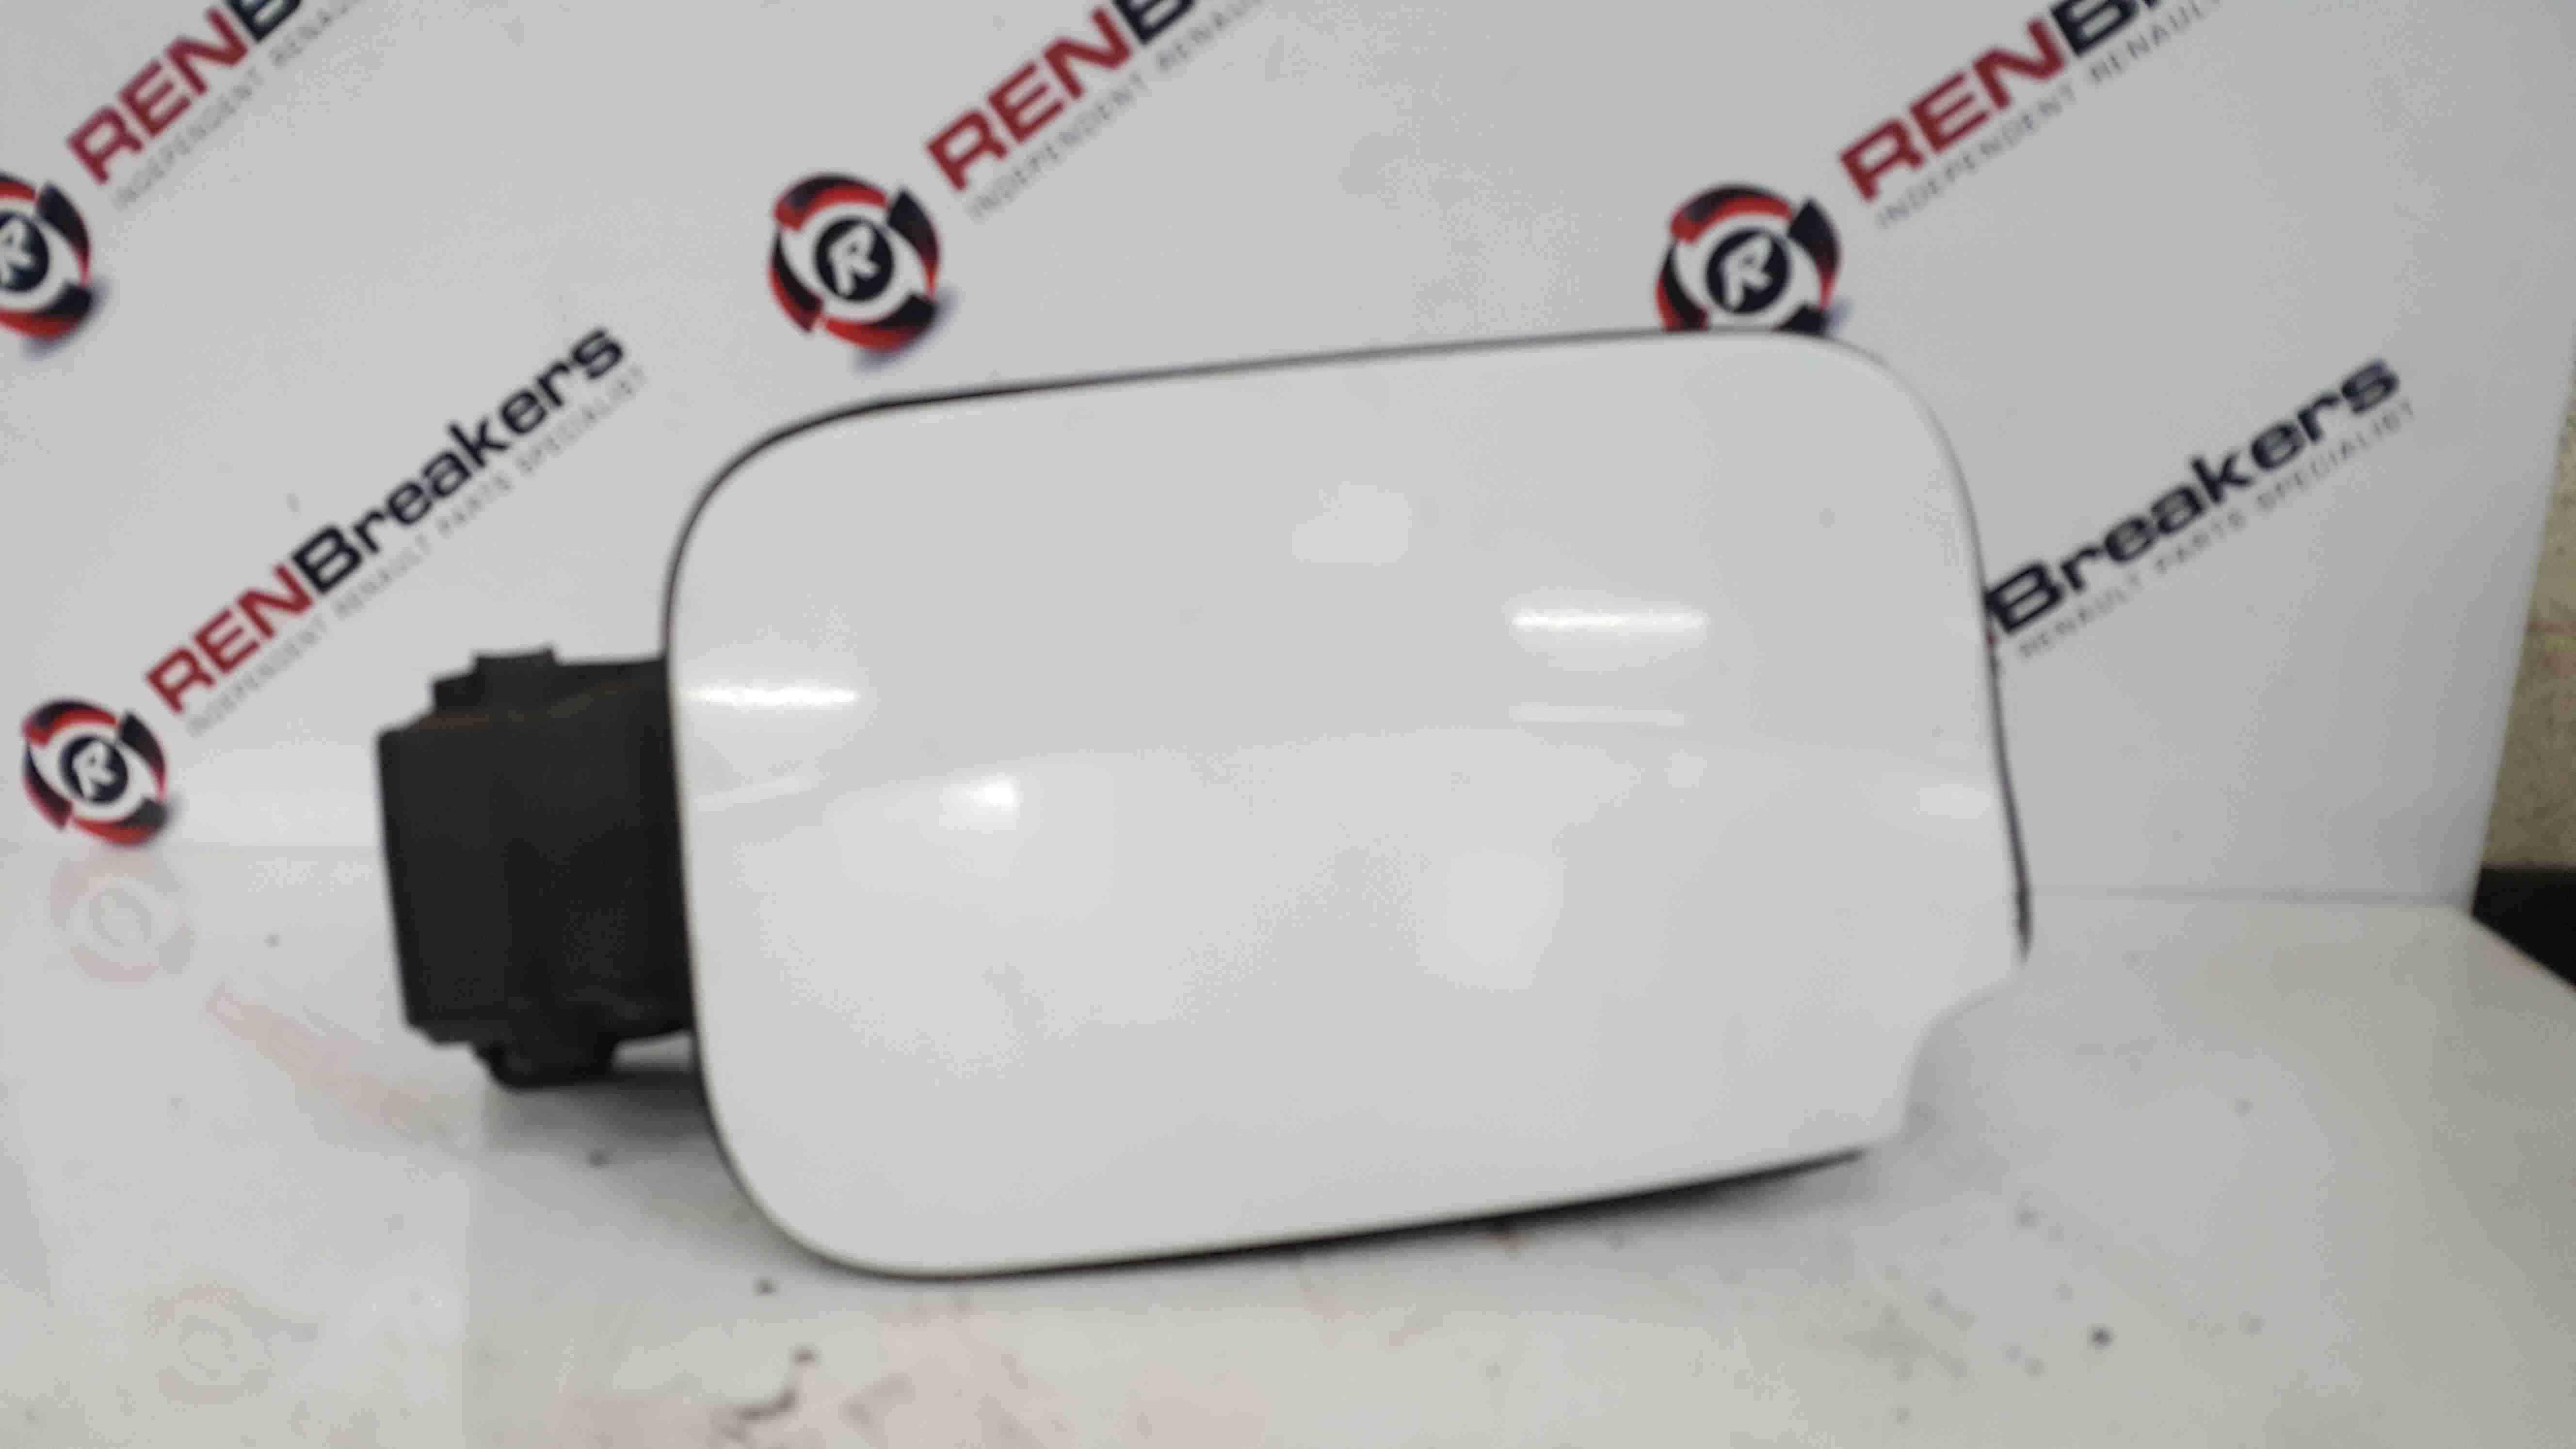 Renault Kangoo 2007-2017 Fuel Flap Cover White 0389 + Backing